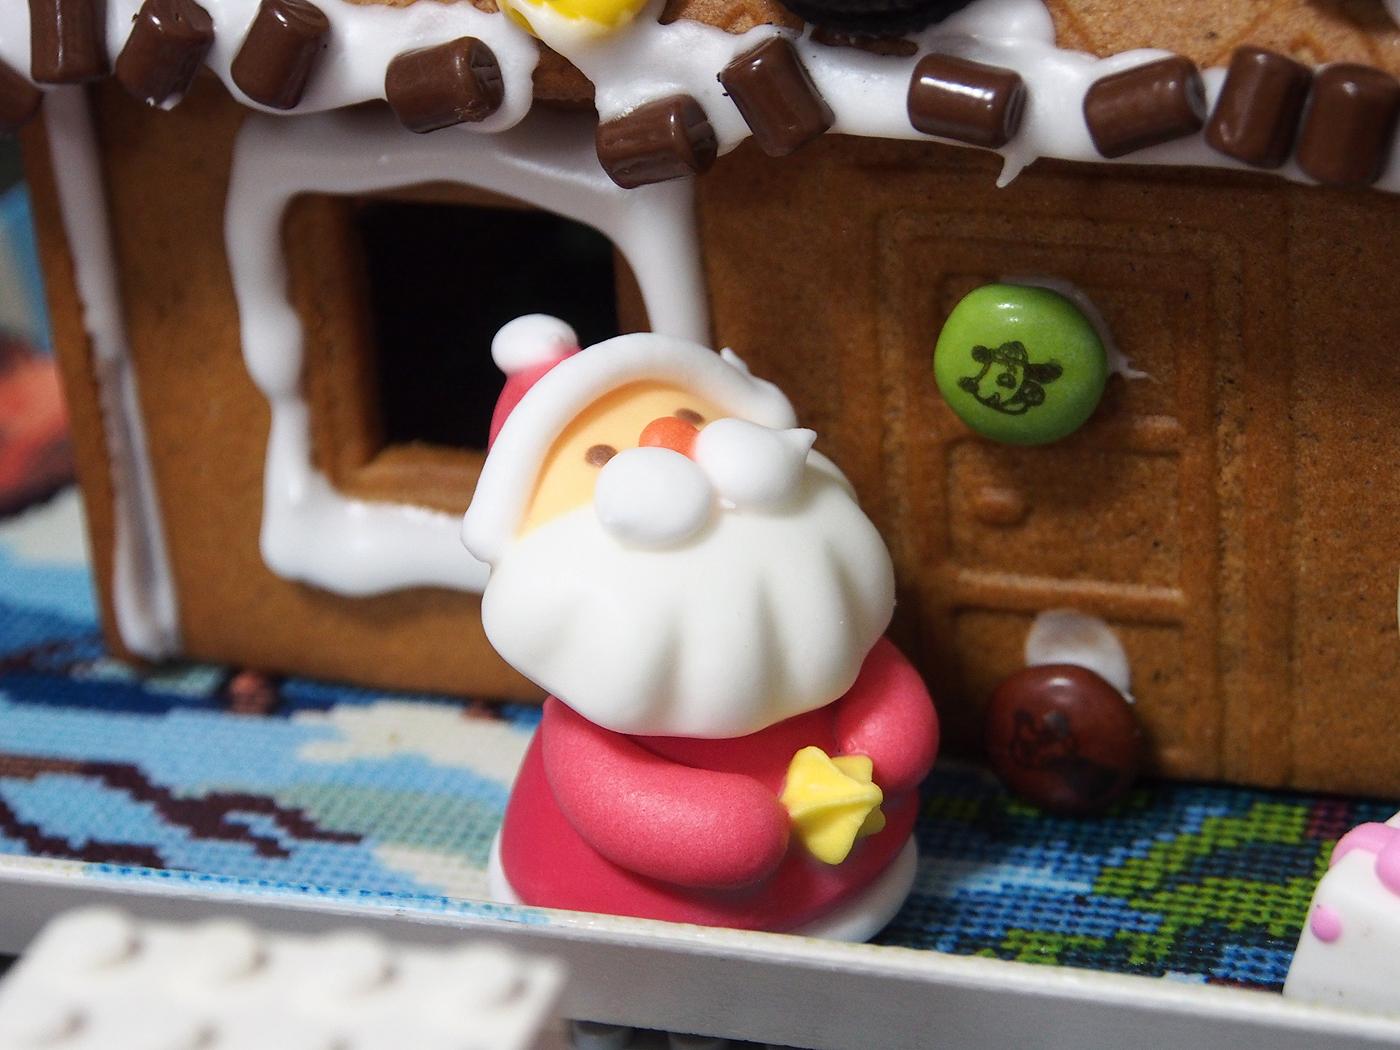 2016IKEAお菓子の家、サンタ